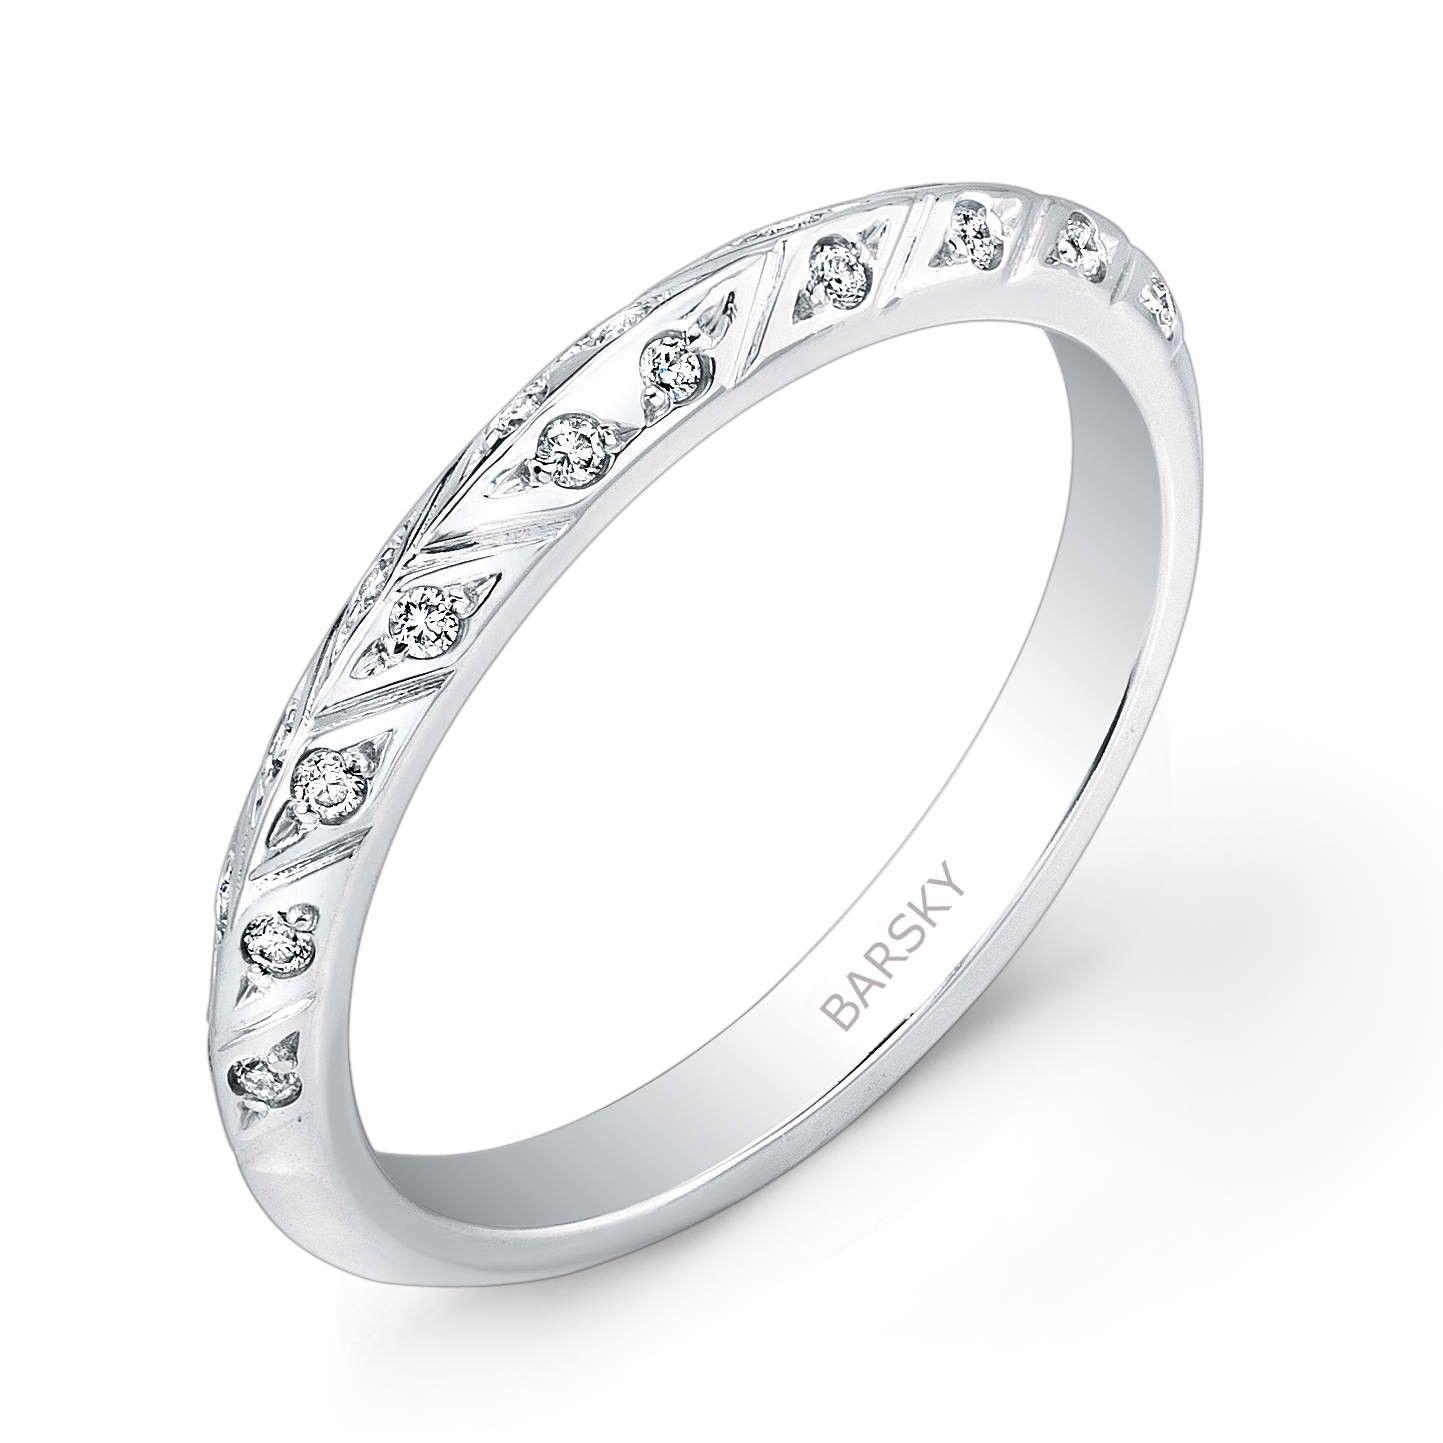 0.10CTW DIAMOND FASHION MENS BAND